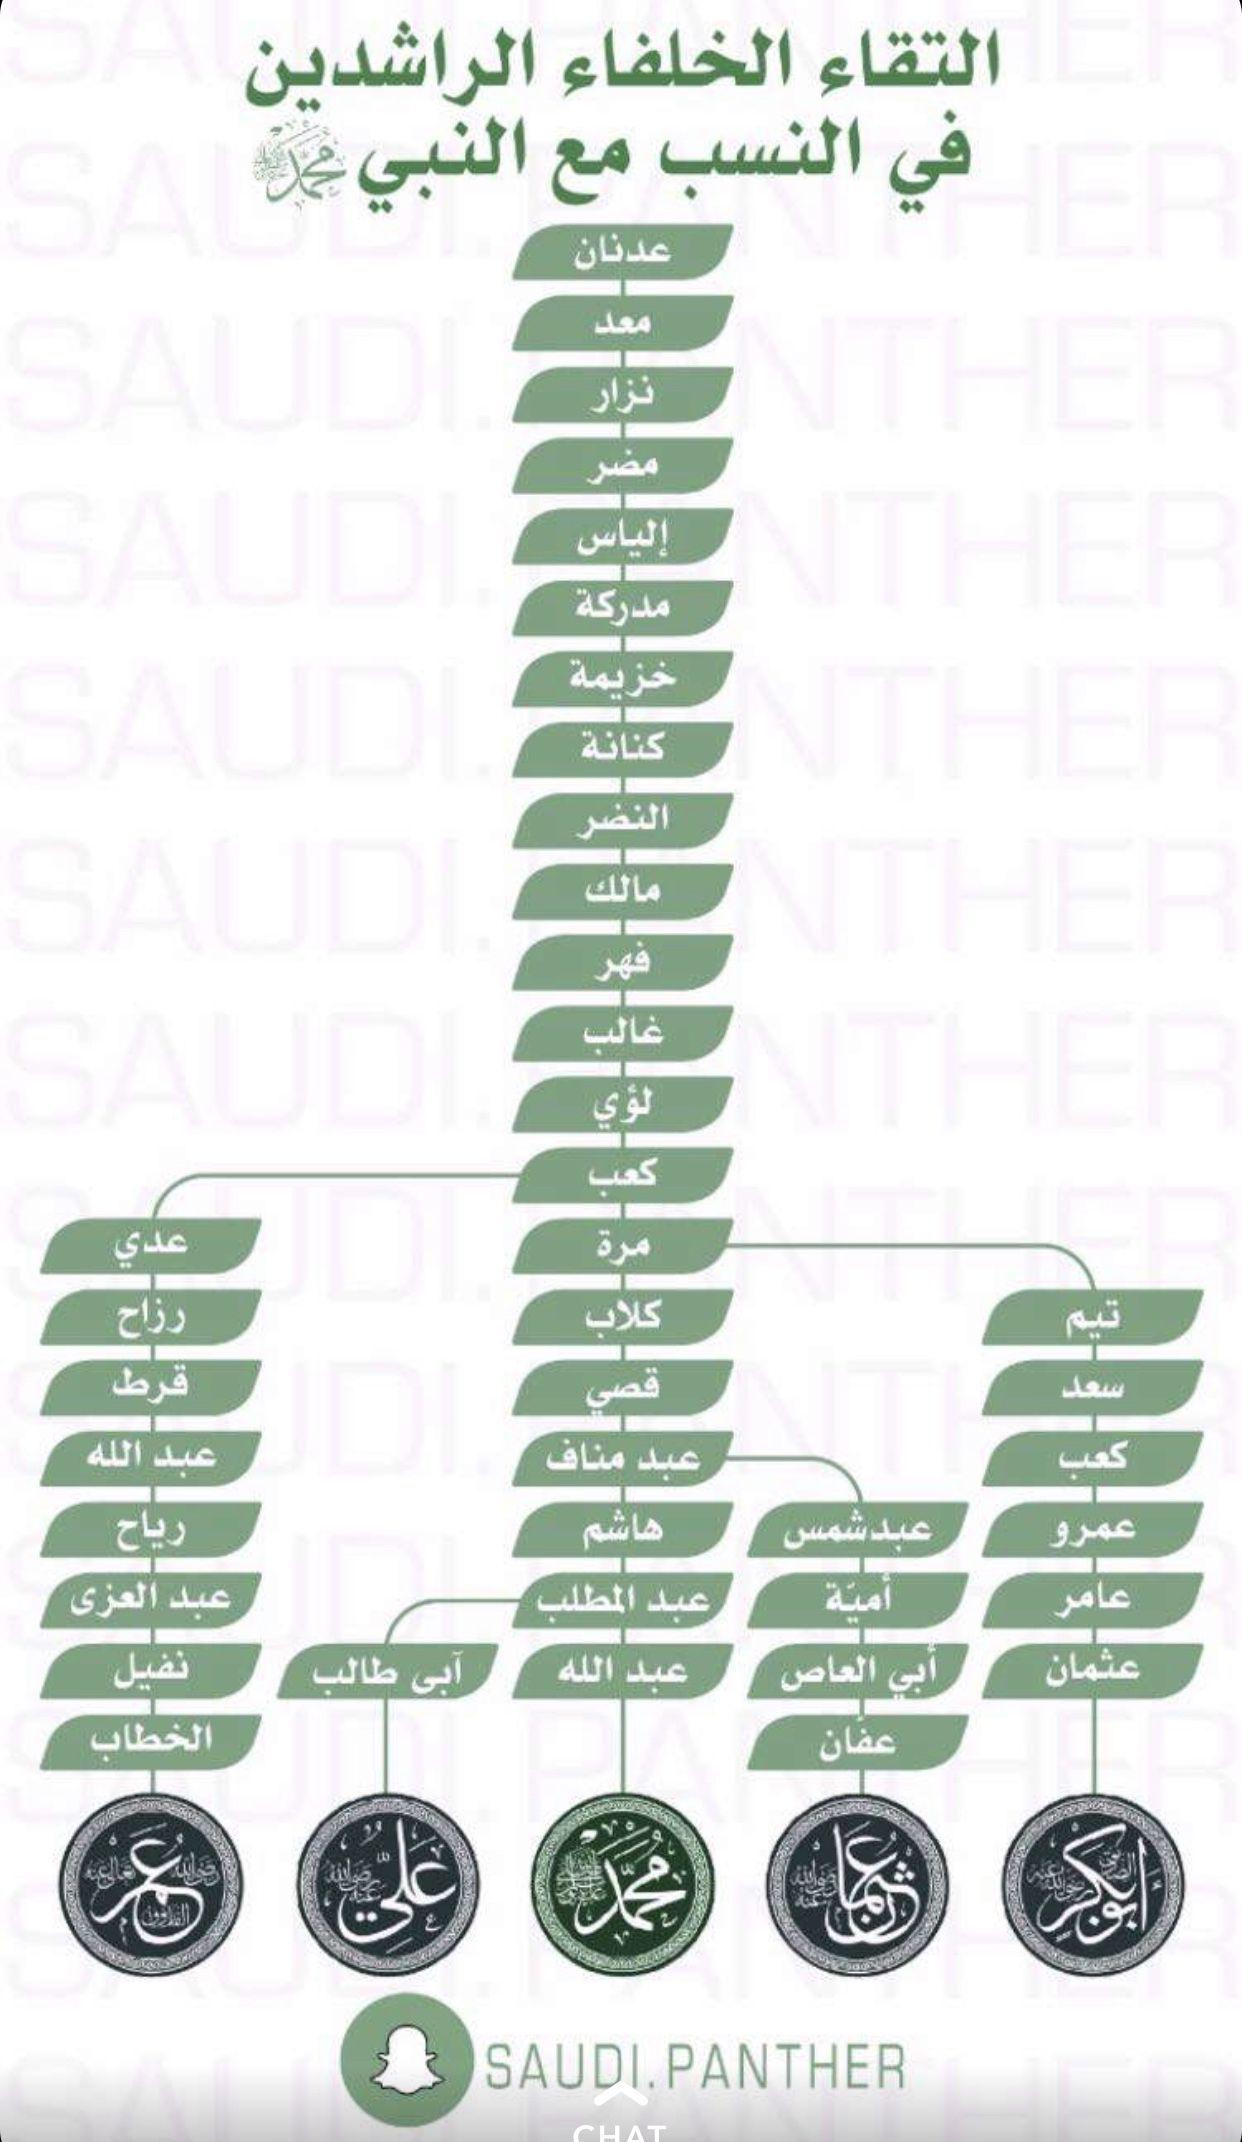 Pin By Iman A On إسلاميات Islam Facts Islam Beliefs Islamic Teachings